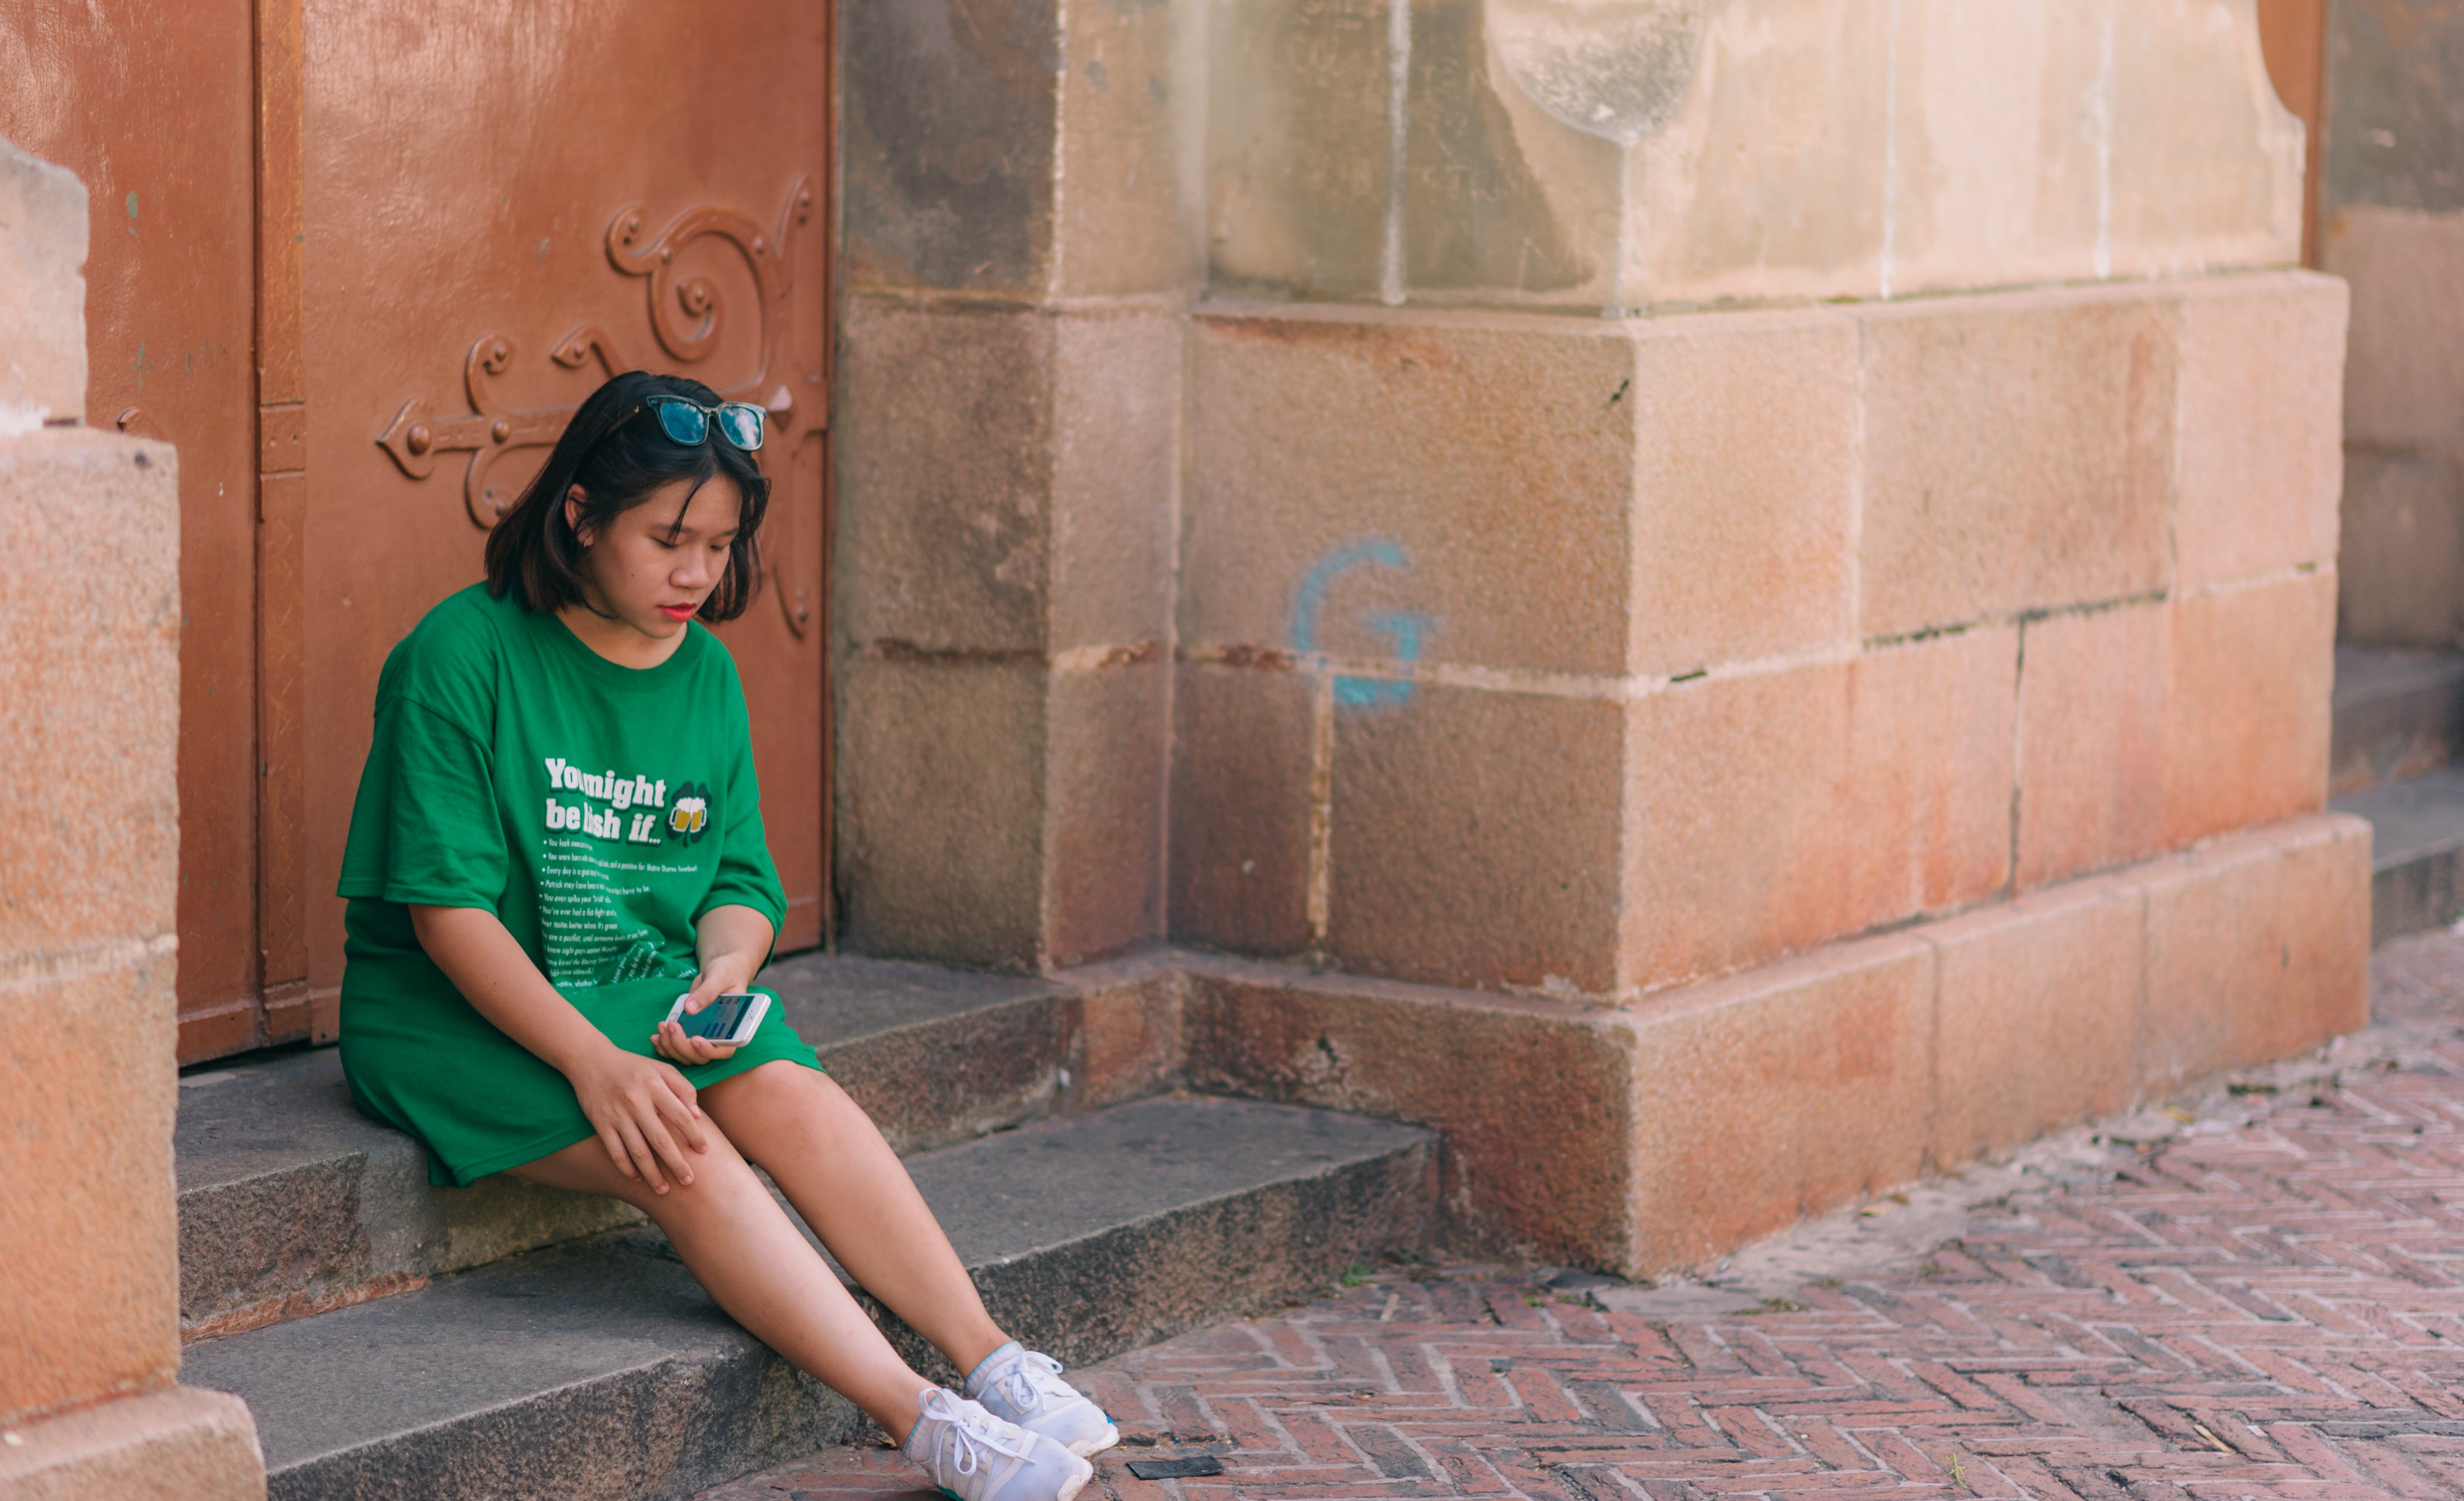 Woman Wearing Green Shirt Sitting Near Brown Gate Holding Smartphone